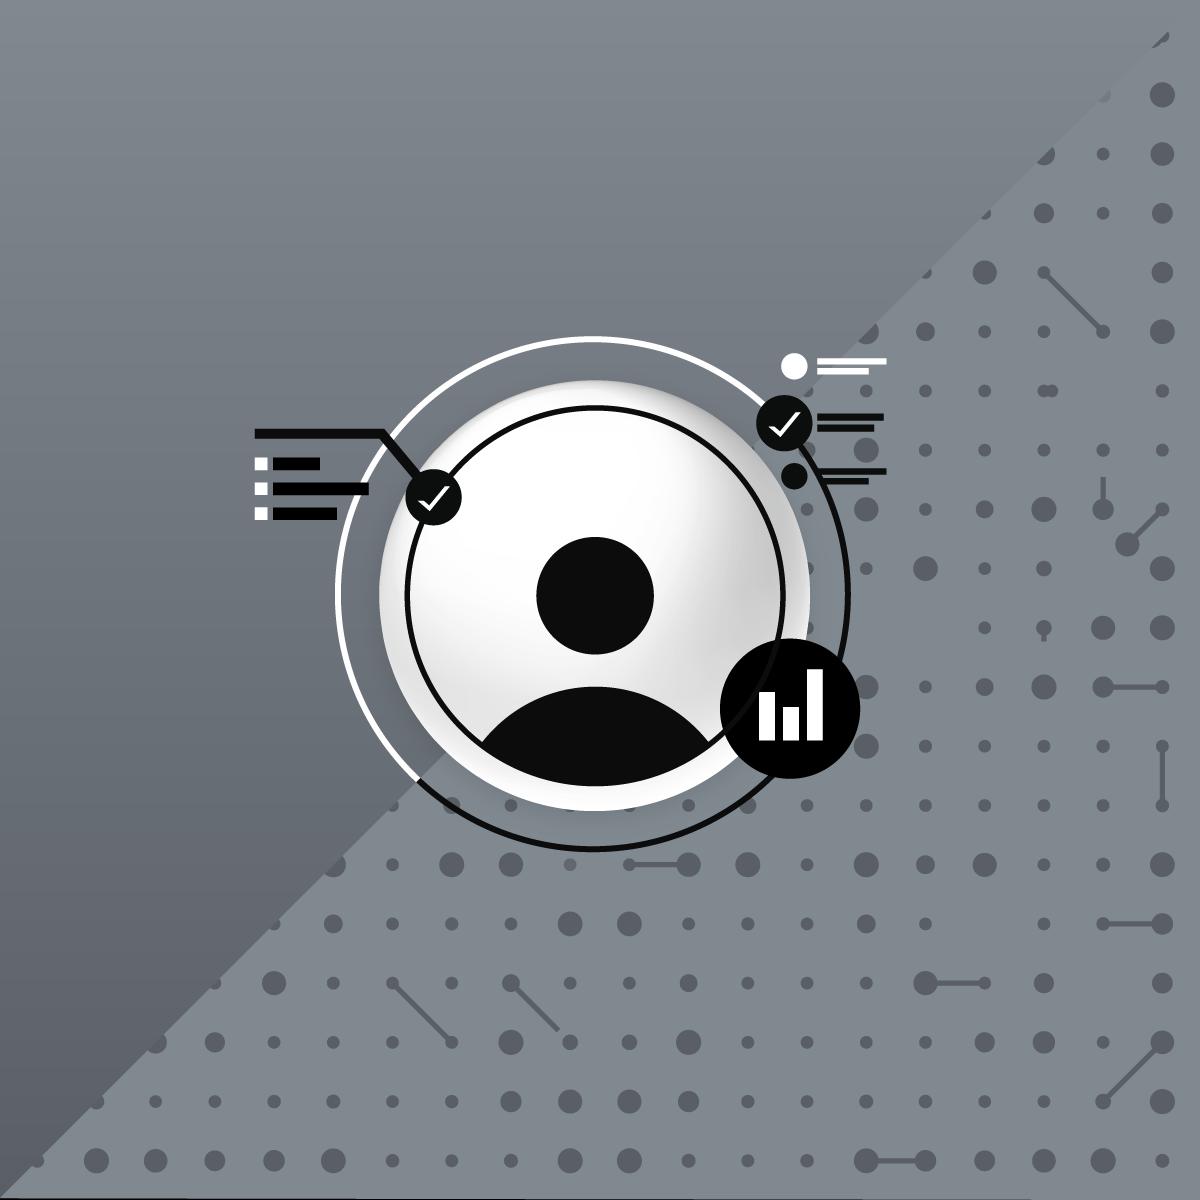 Image of Personalization usecase hero